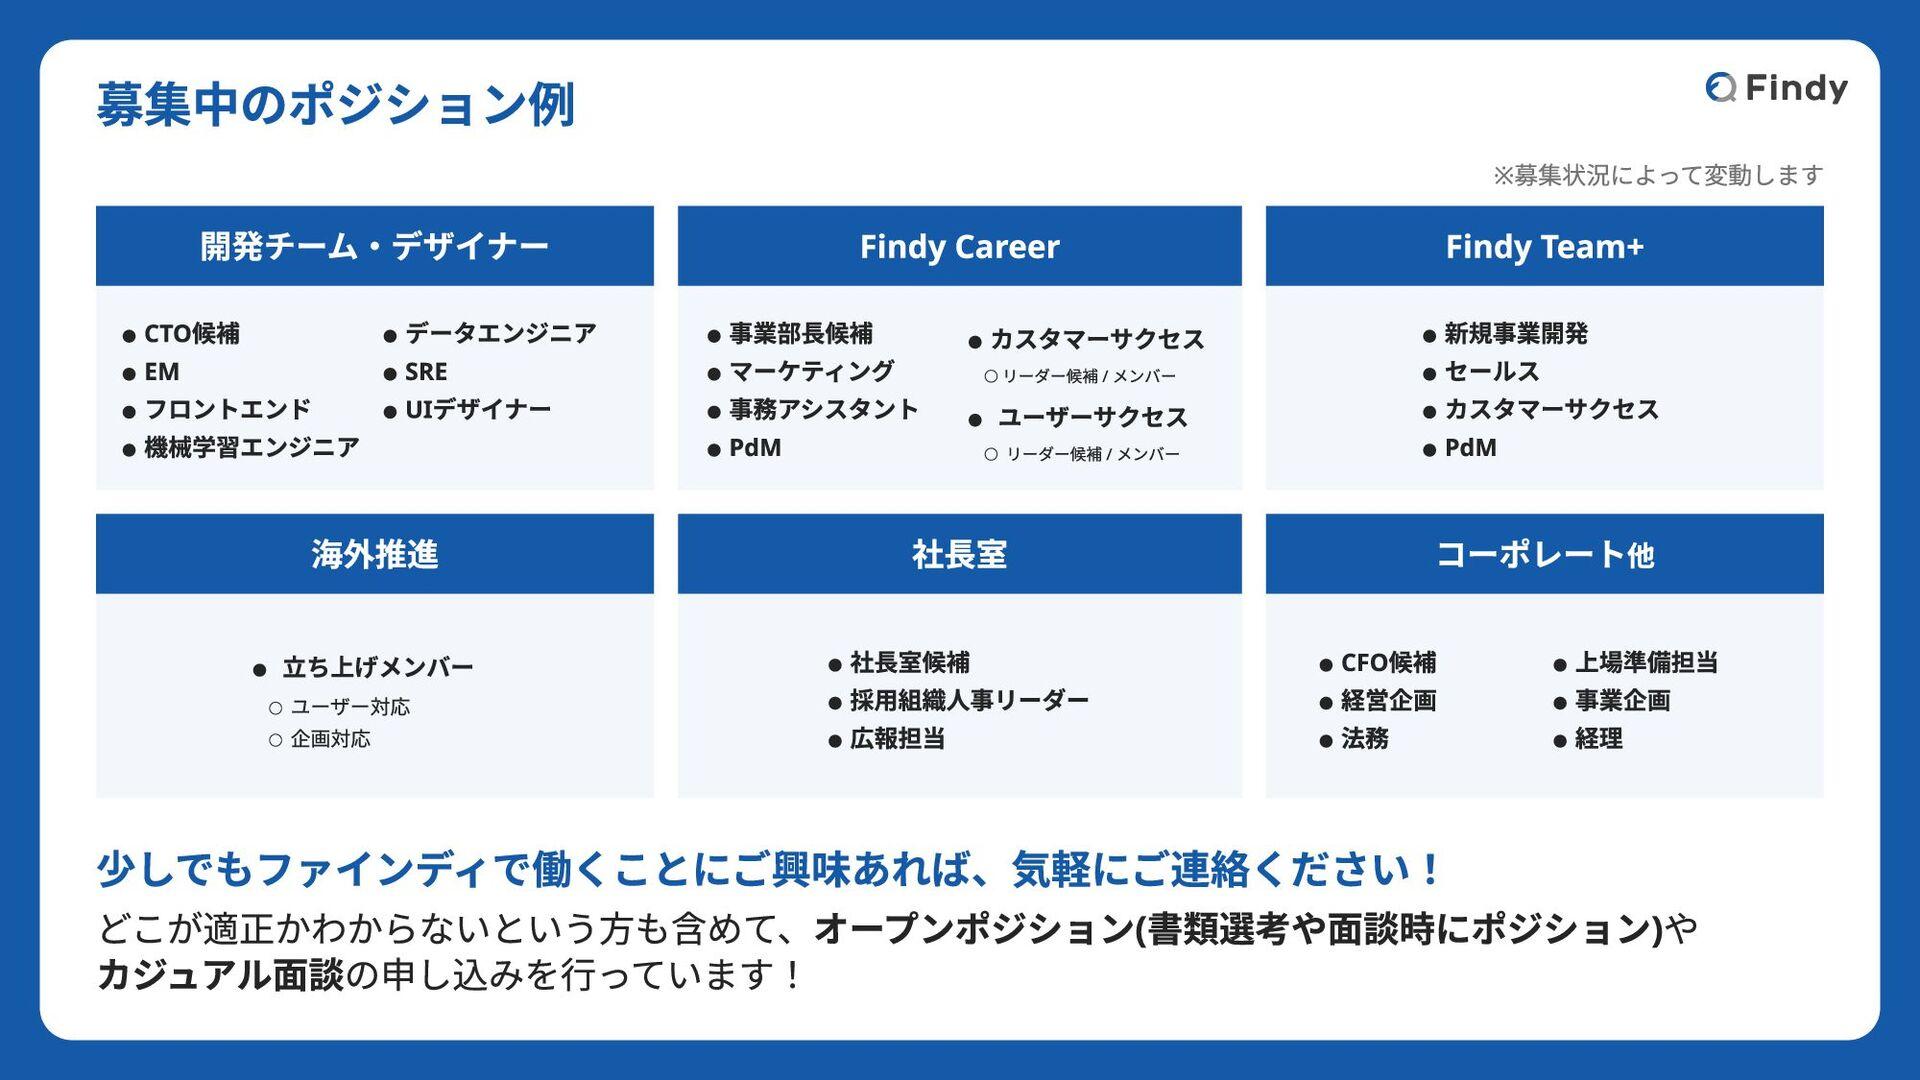 ©2021 Findy Inc. 代表山田の発信 ● 会社紹介資料 ○ Speakerdeck...